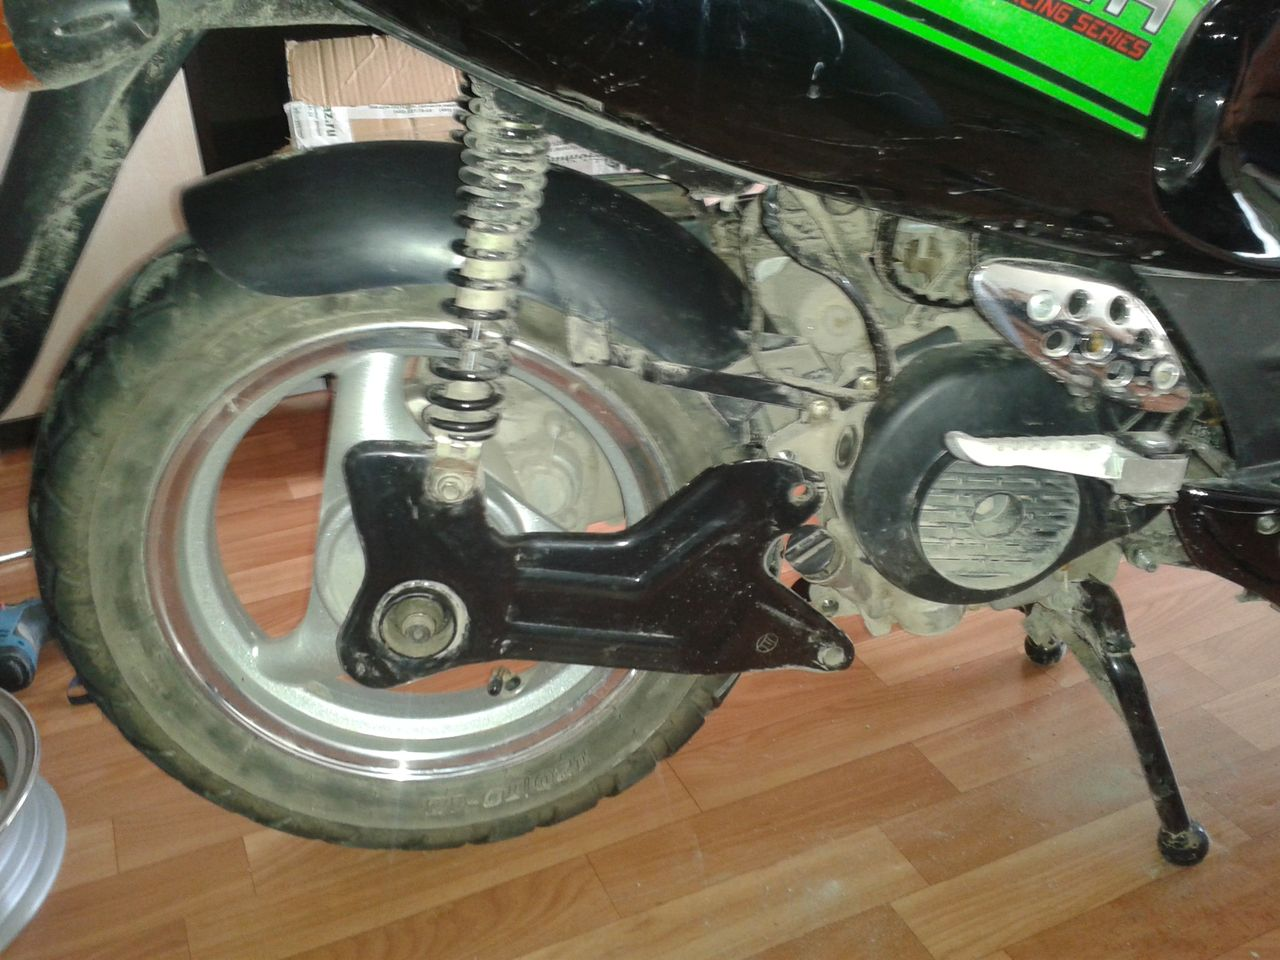 Замена заднего амортизатора на скутере